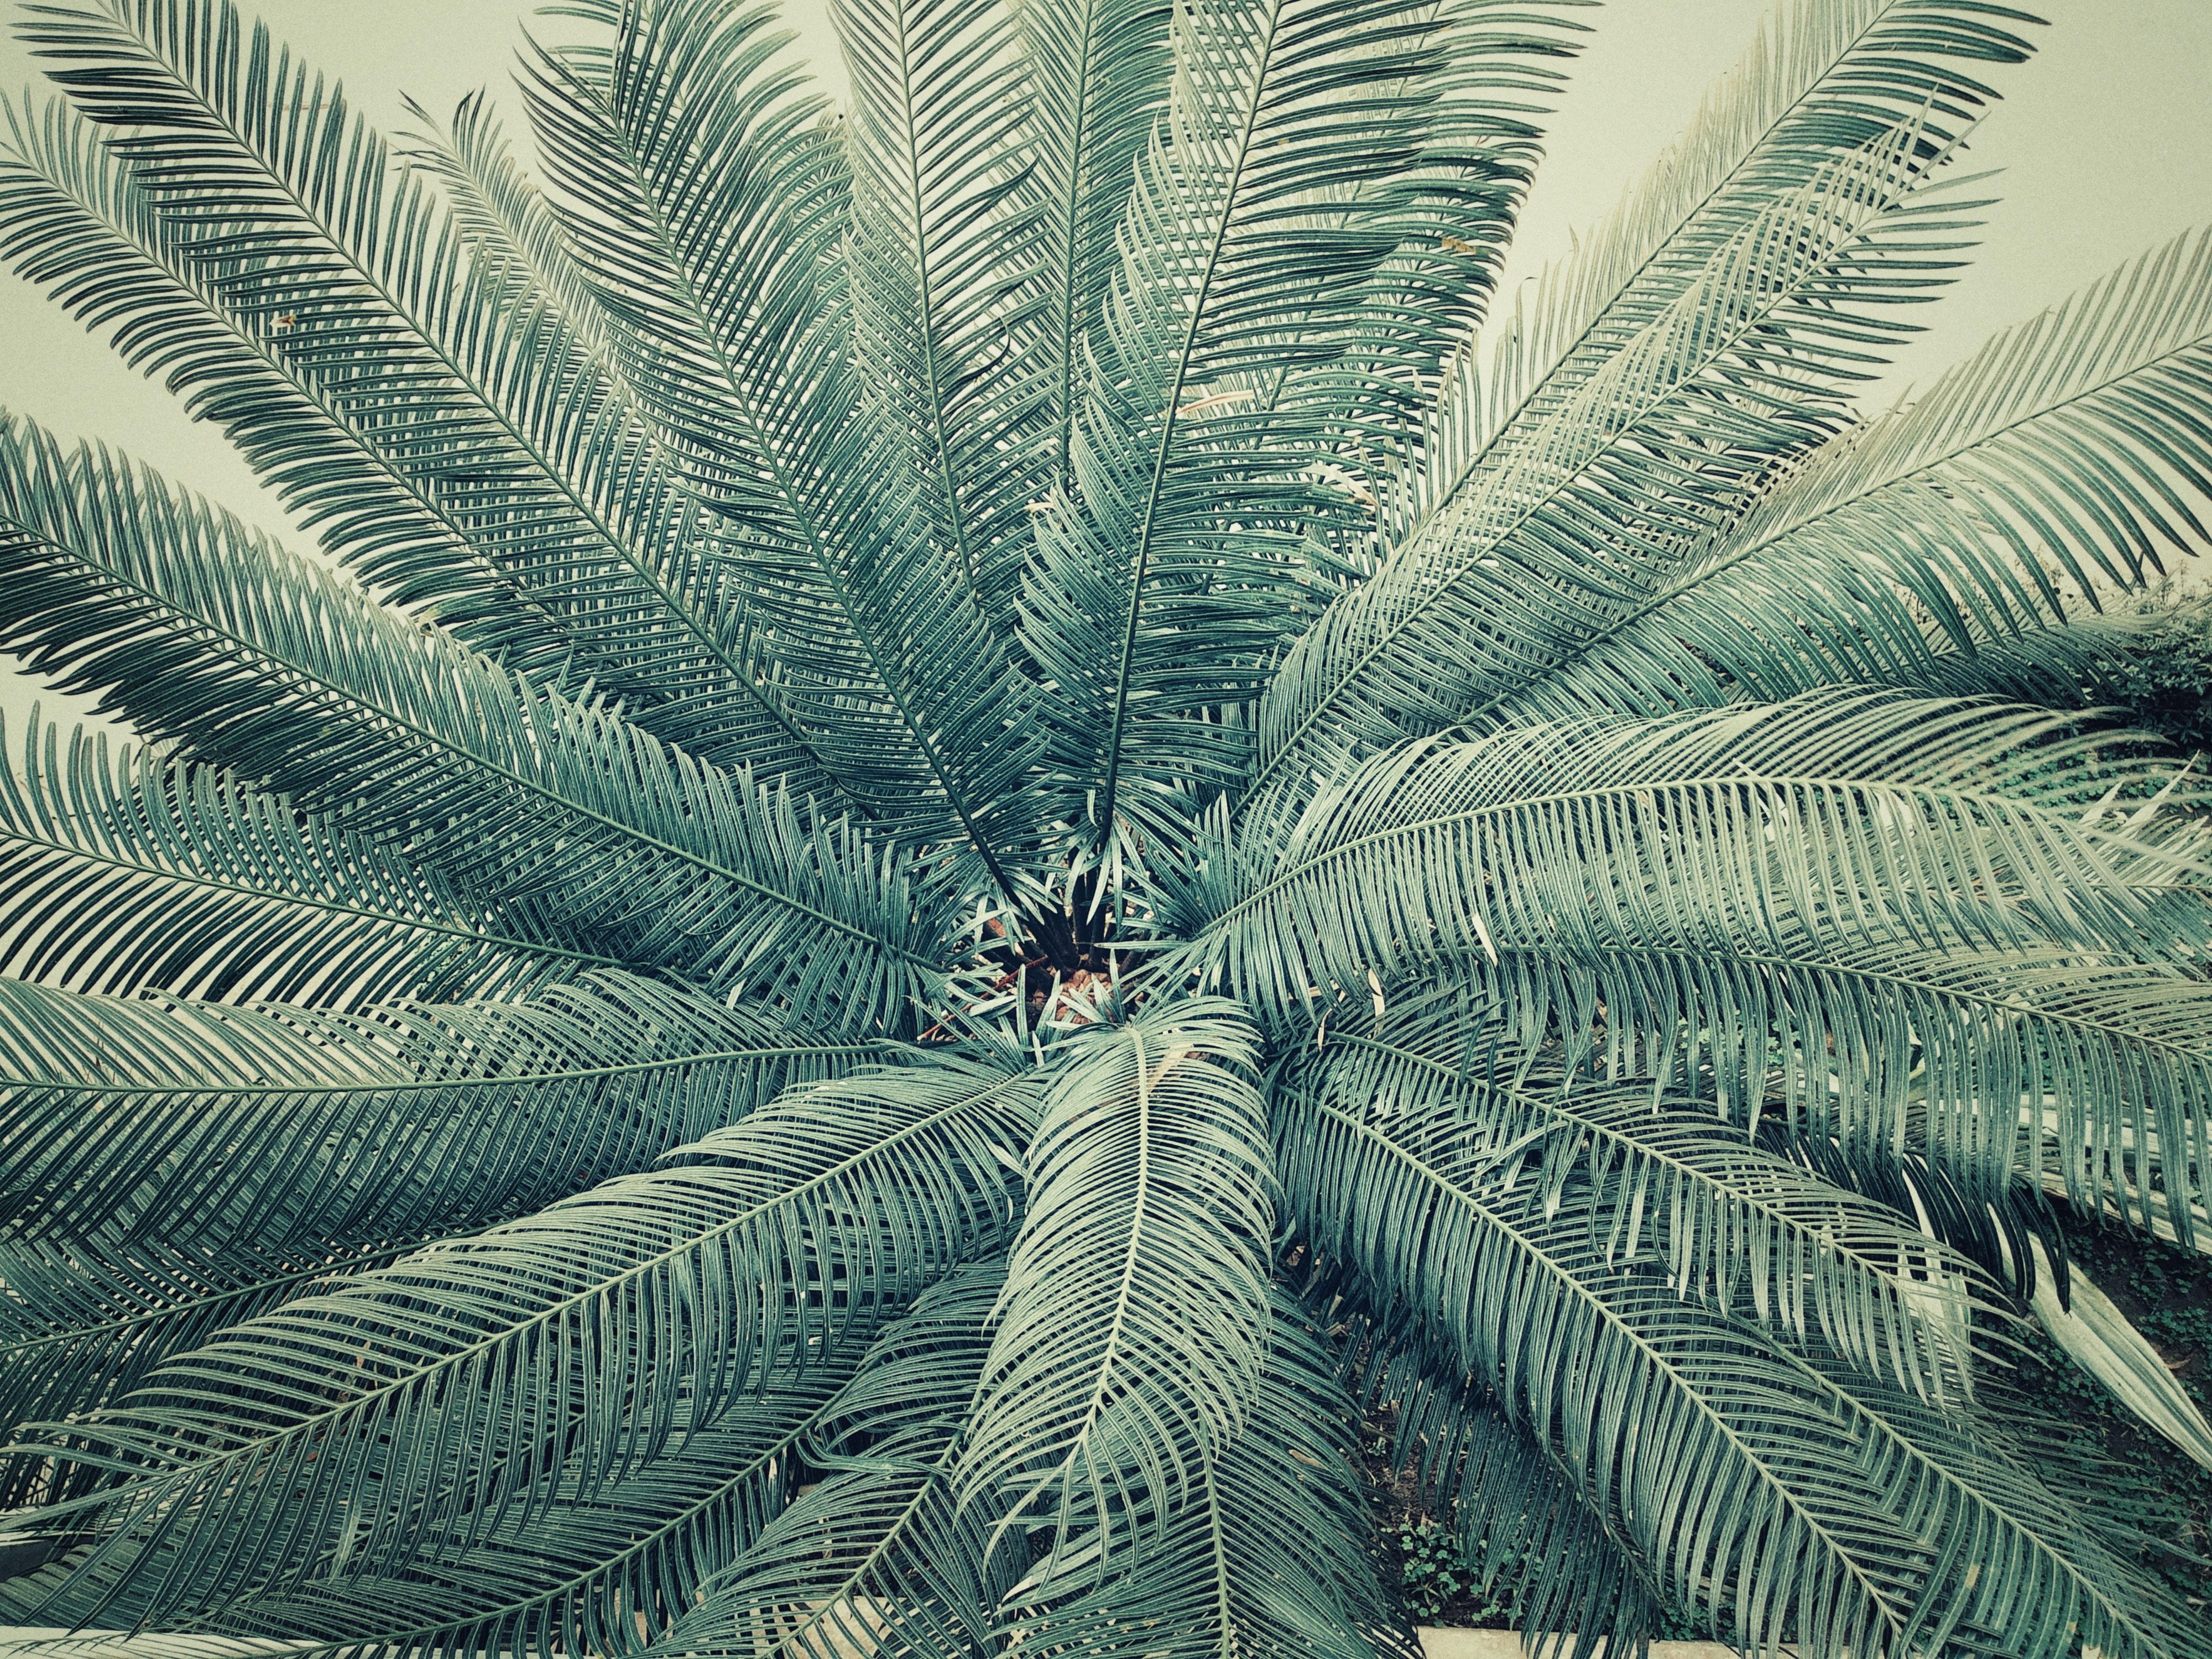 Palm Tree, Abstract, Palm, Tree, Travel, HQ Photo